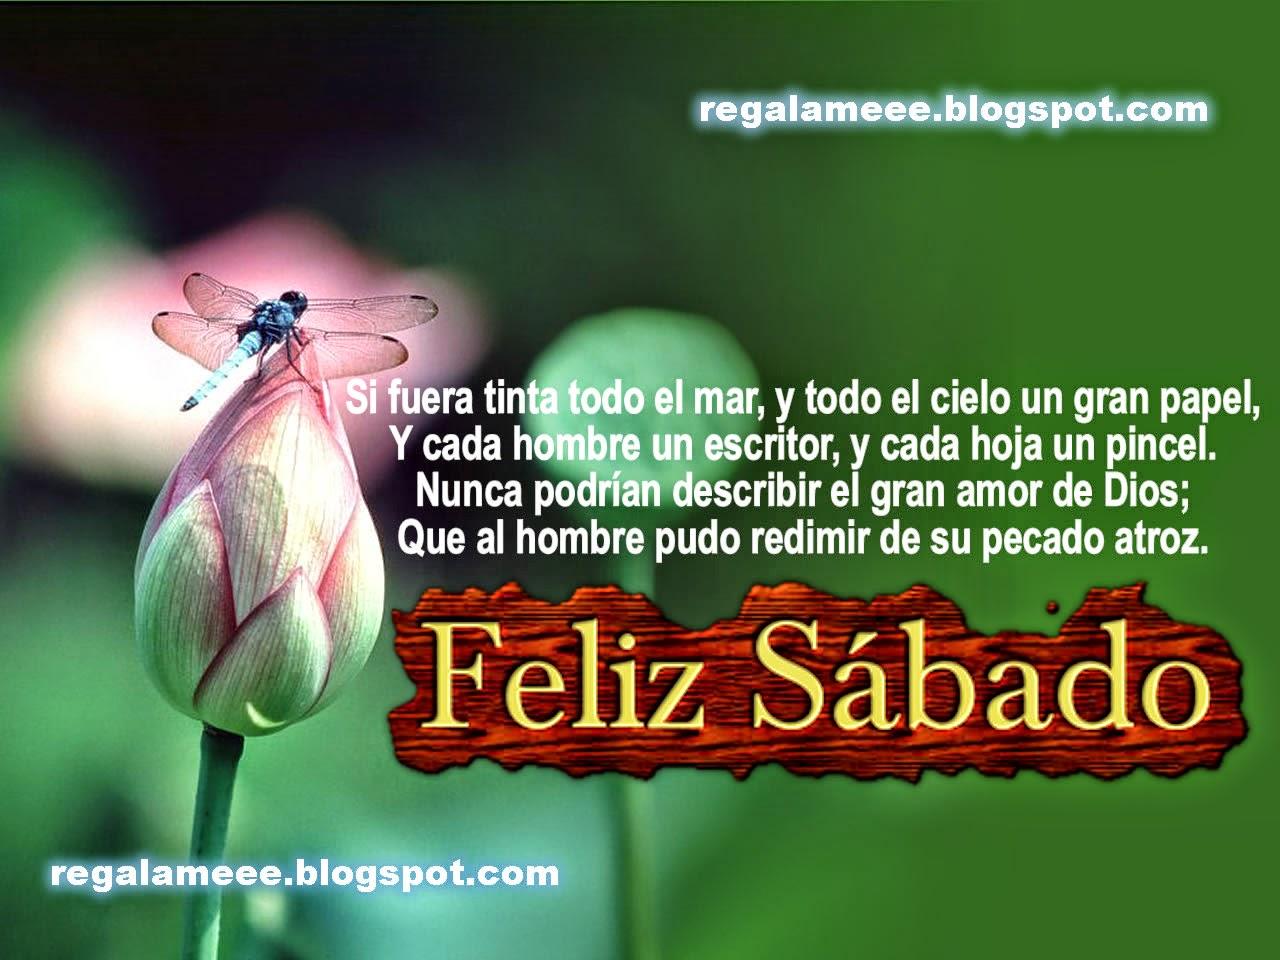 2018 Feliz Sabado Imagenes Feliz Sabado Imagenes Comicas